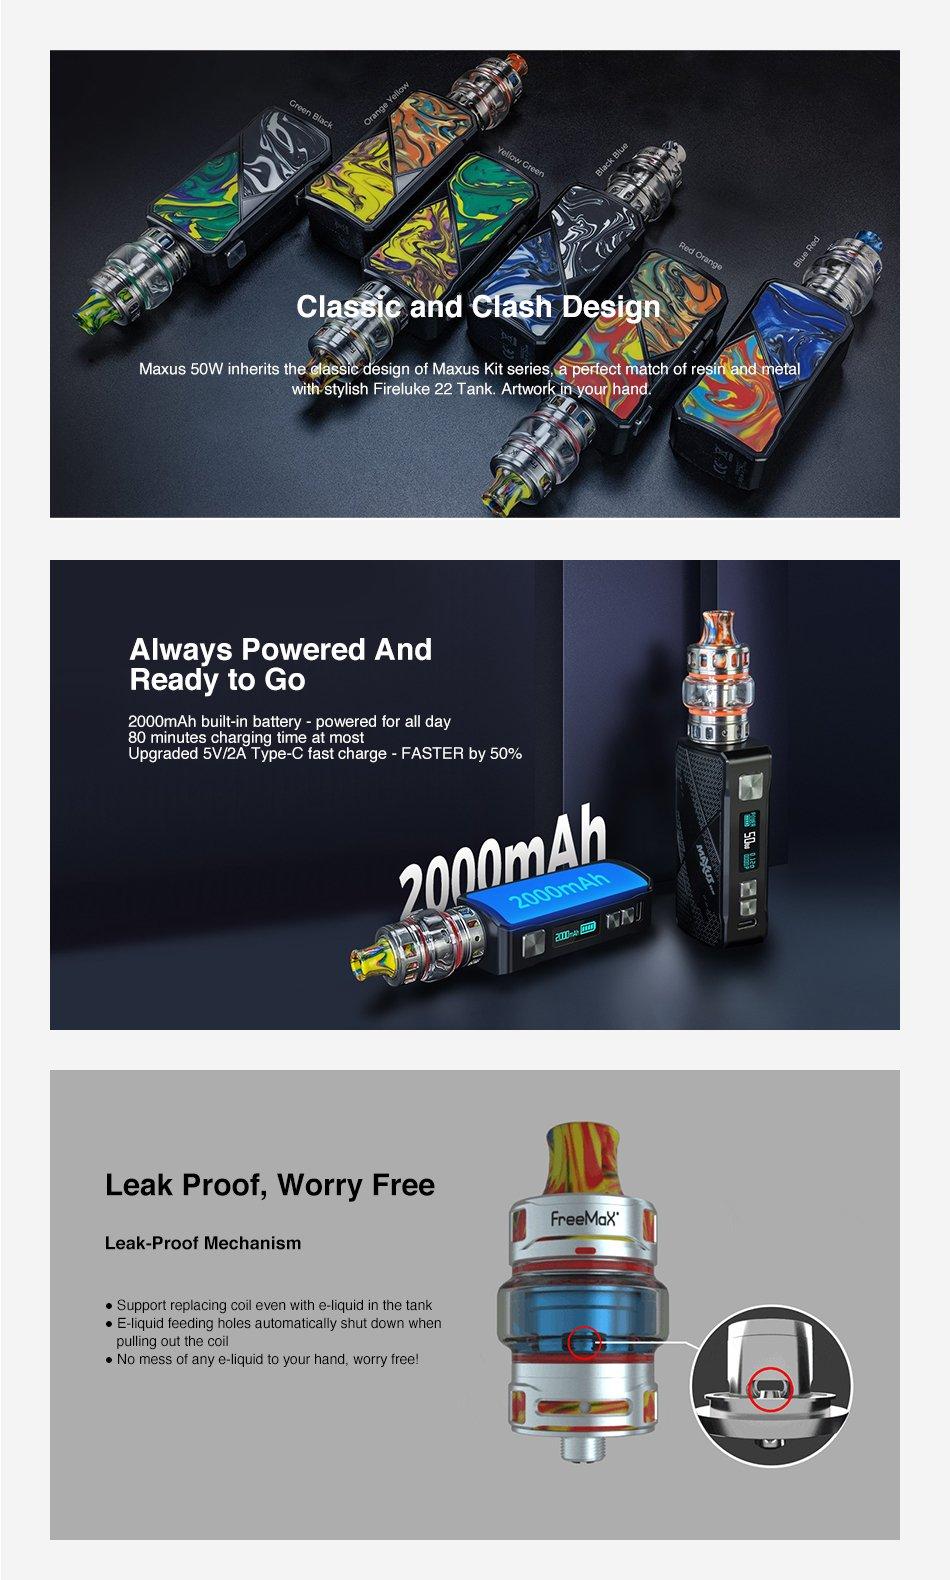 Freemax Maxus Kits 50W Features UK